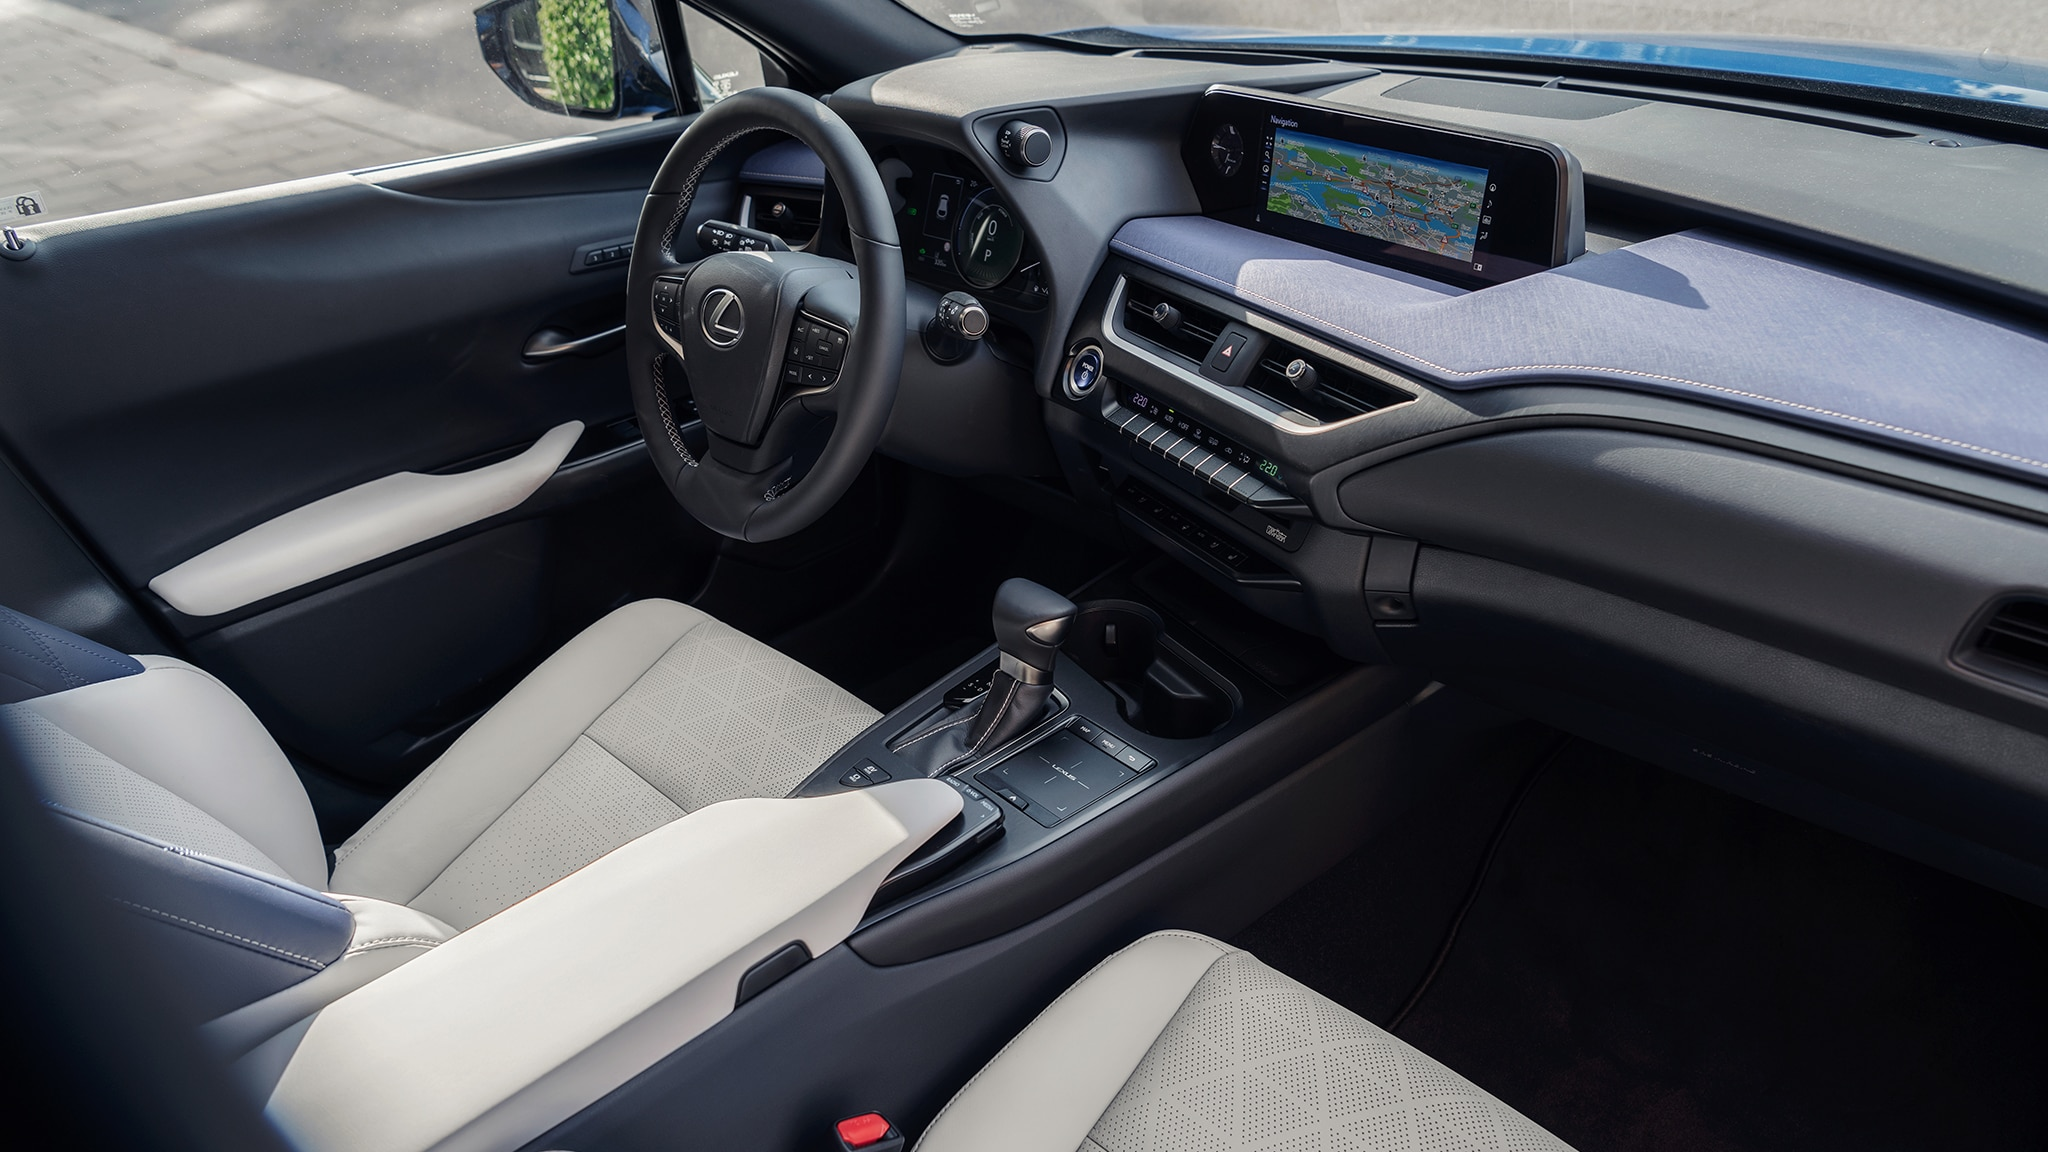 2019 Lexus Ux Interior Cobalt 11 31 Octubre 2018 Miguel Cortina